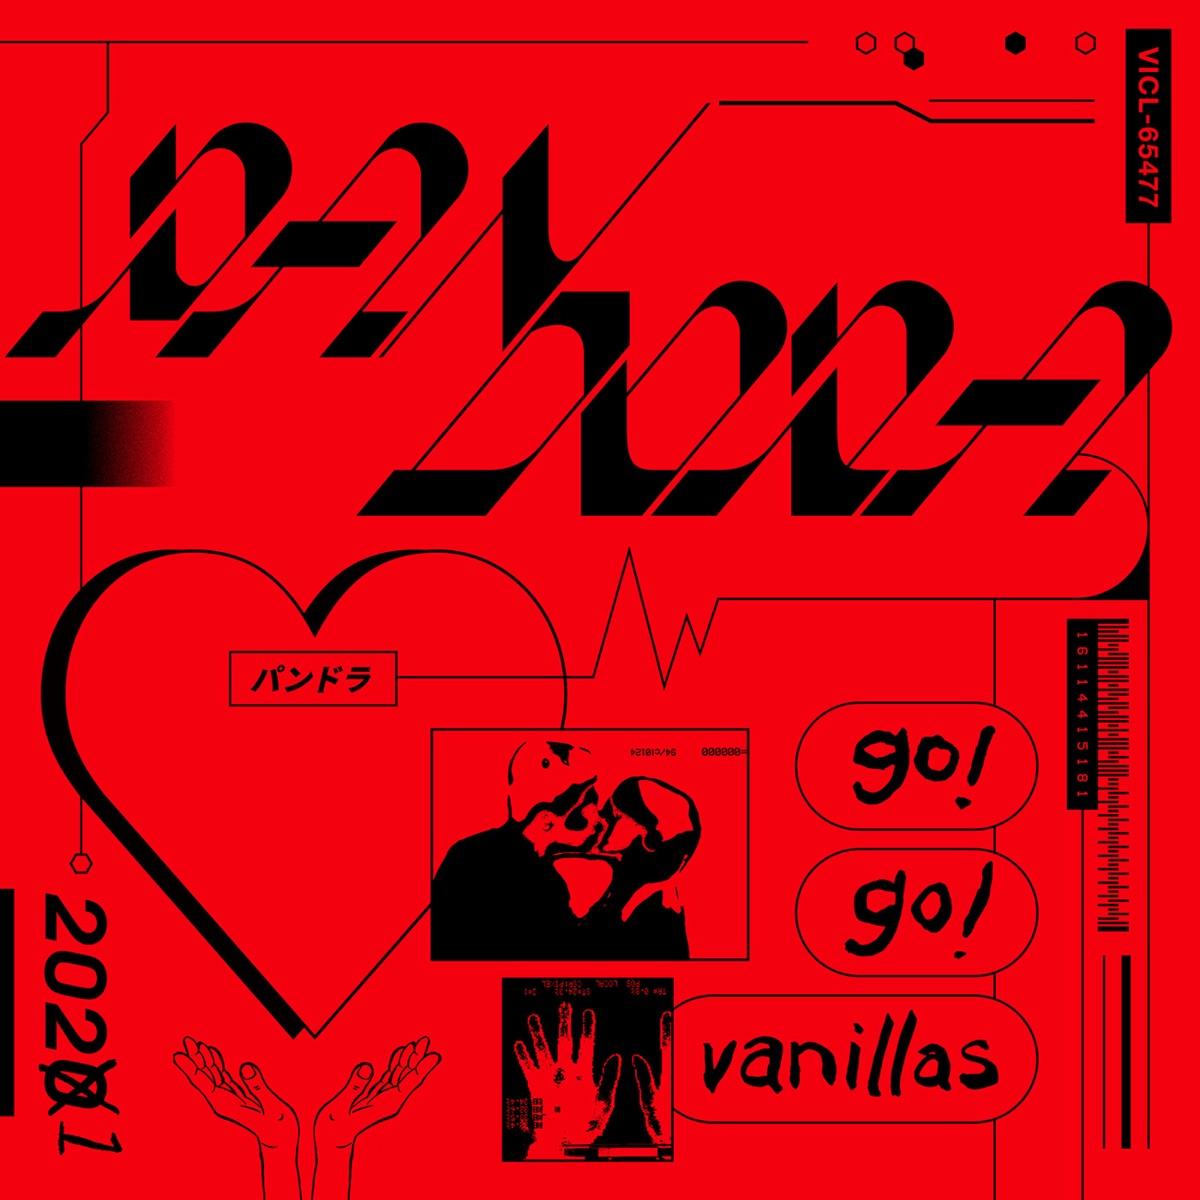 『go!go!vanillas - 倫敦』収録の『PANDORA』ジャケット